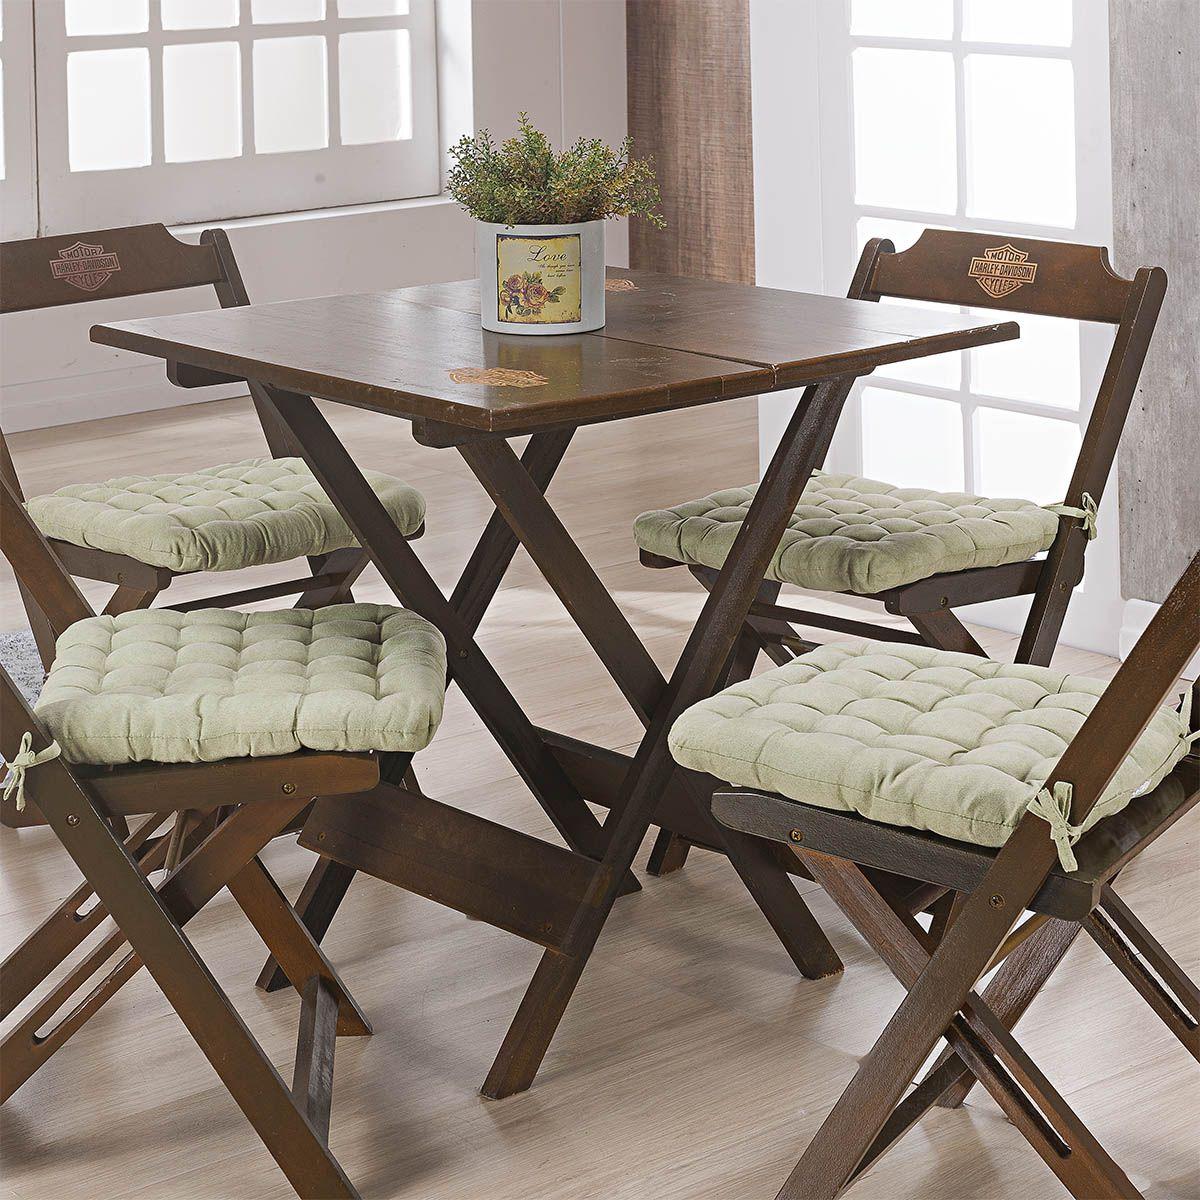 Kit C/ 4 - Assentos P/ Cadeira - Futton - Kalamar - 40cm x 40cm - Verde - Niazitex